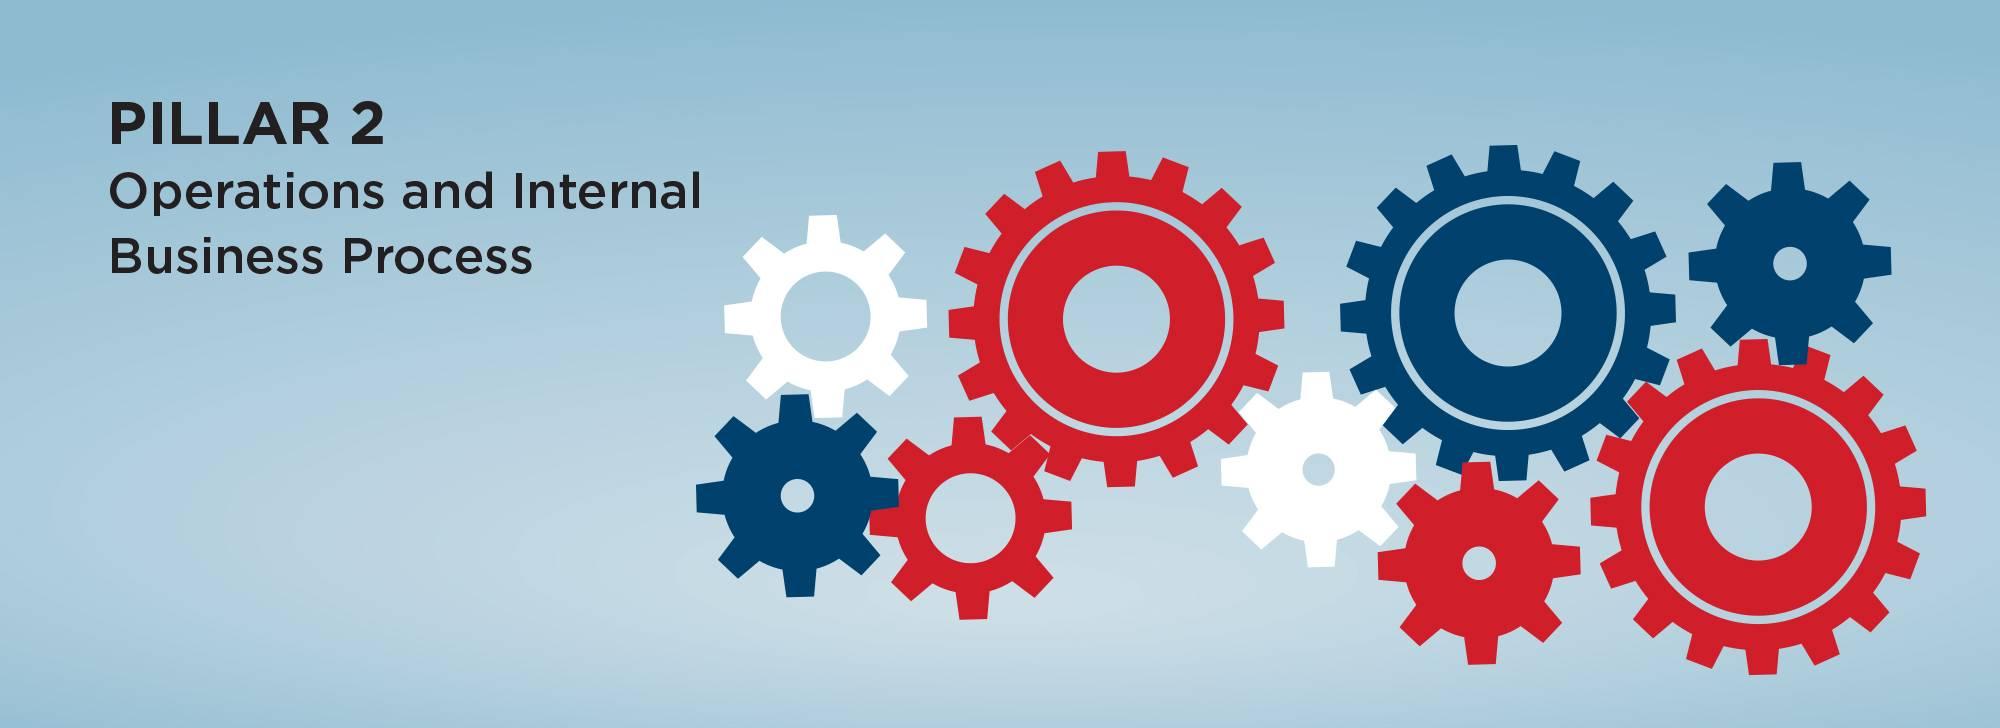 Pillar 2: Operations and Internal Business Process